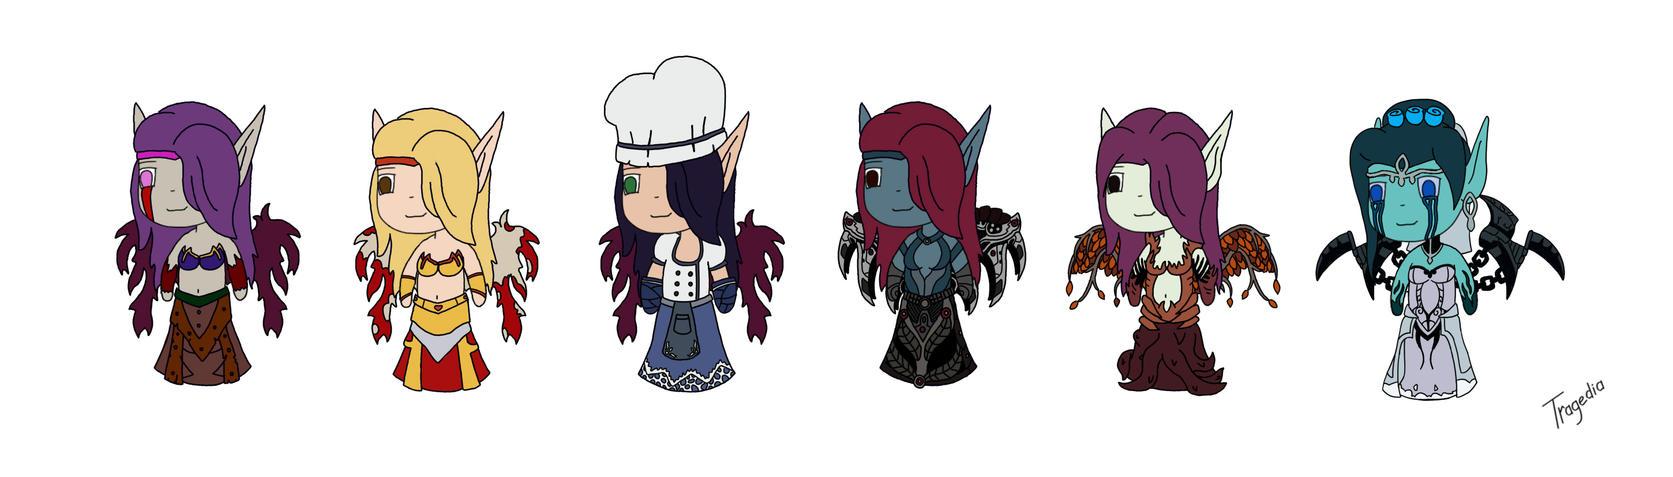 Morgana skins by TragediaIrk